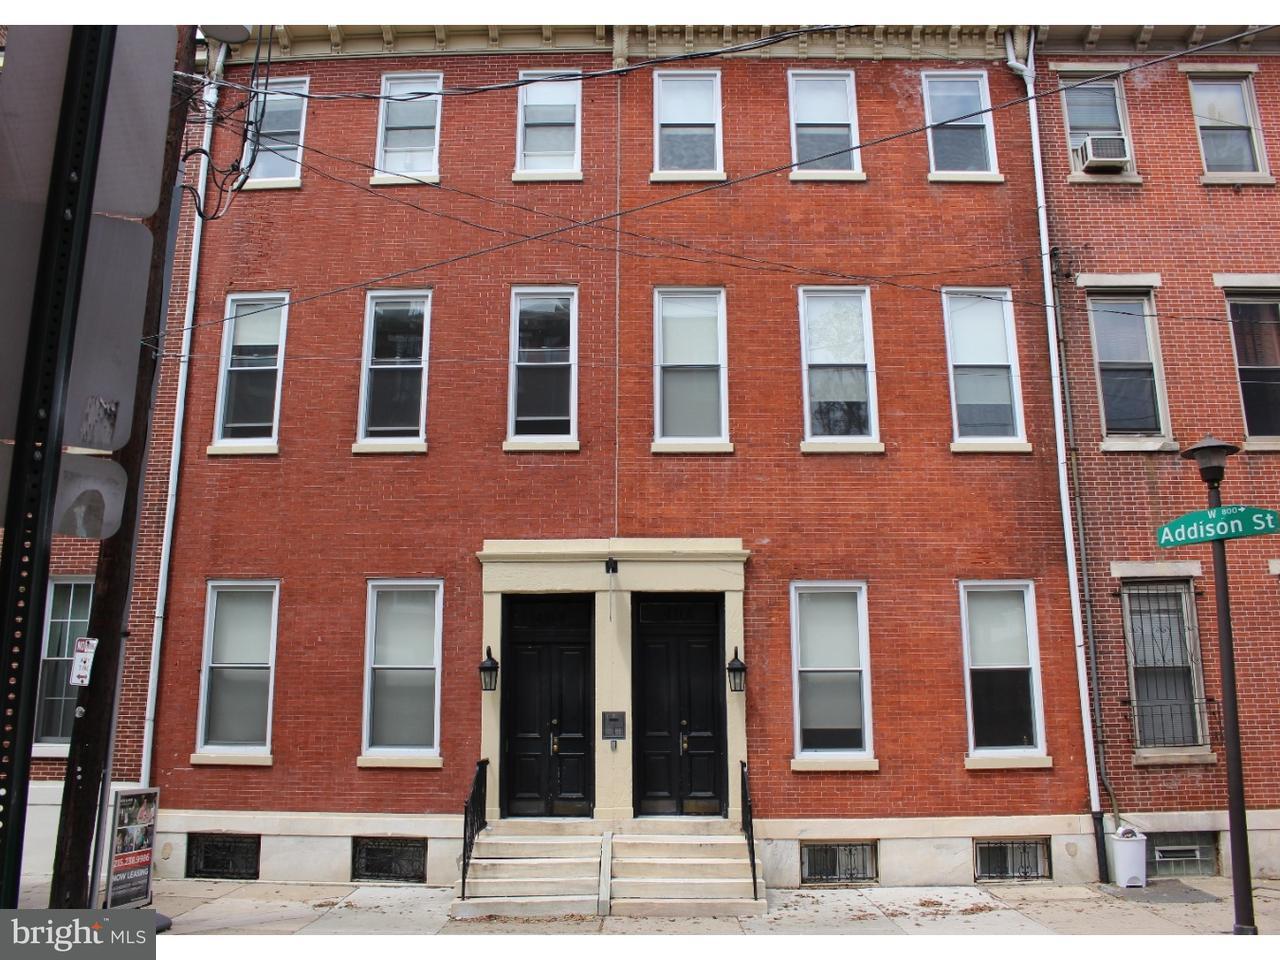 Single Family Home for Rent at 406 S 9TH ST #3R Philadelphia, Pennsylvania 19147 United States